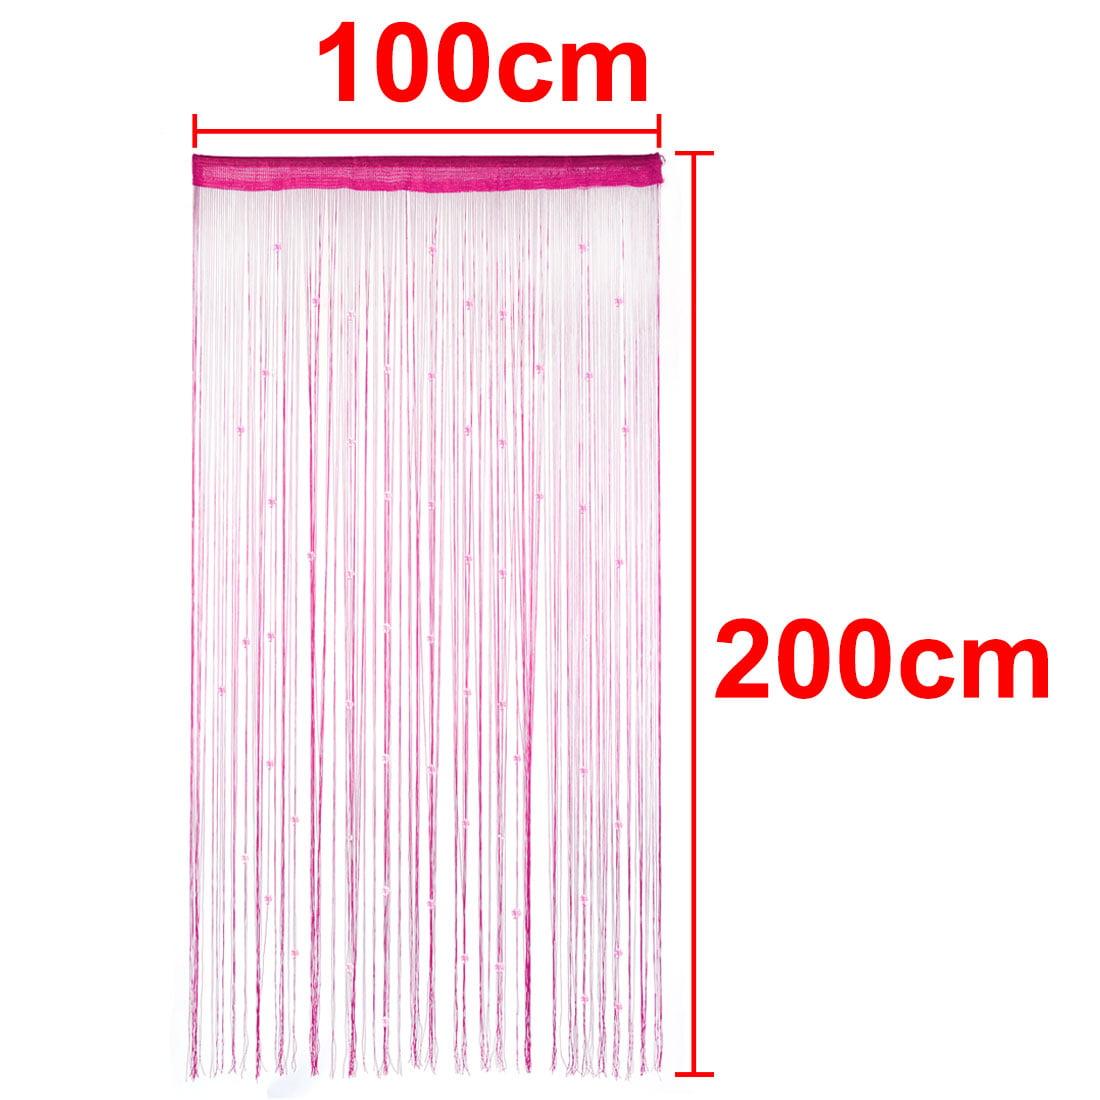 Home Decor Polyester Door Window String Bead Curtain Tassel Fuchsia 100 x 200cm - image 1 de 3